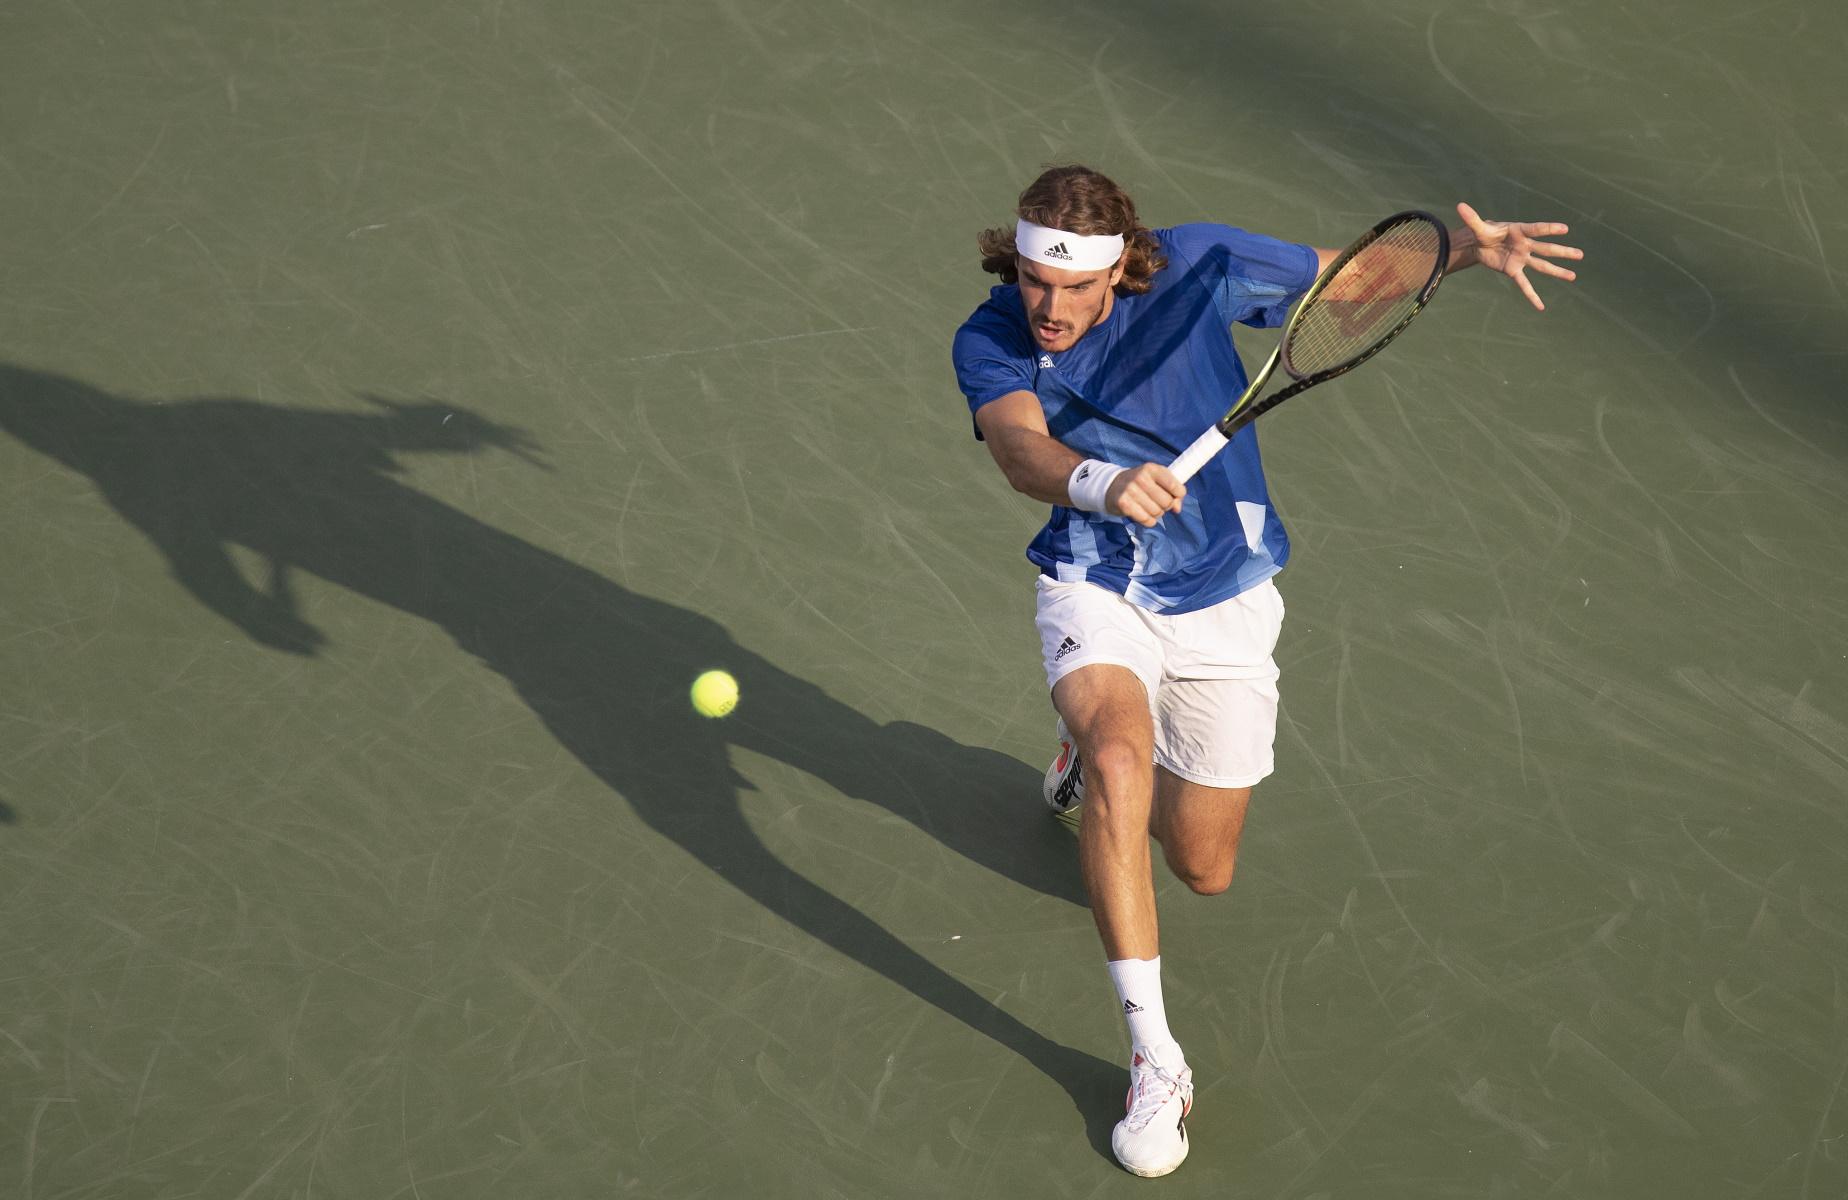 US Open: Με Στέφανο Τσιτσιπά και Βαλεντίνη Γραμματικοπούλου η πρεμιέρα